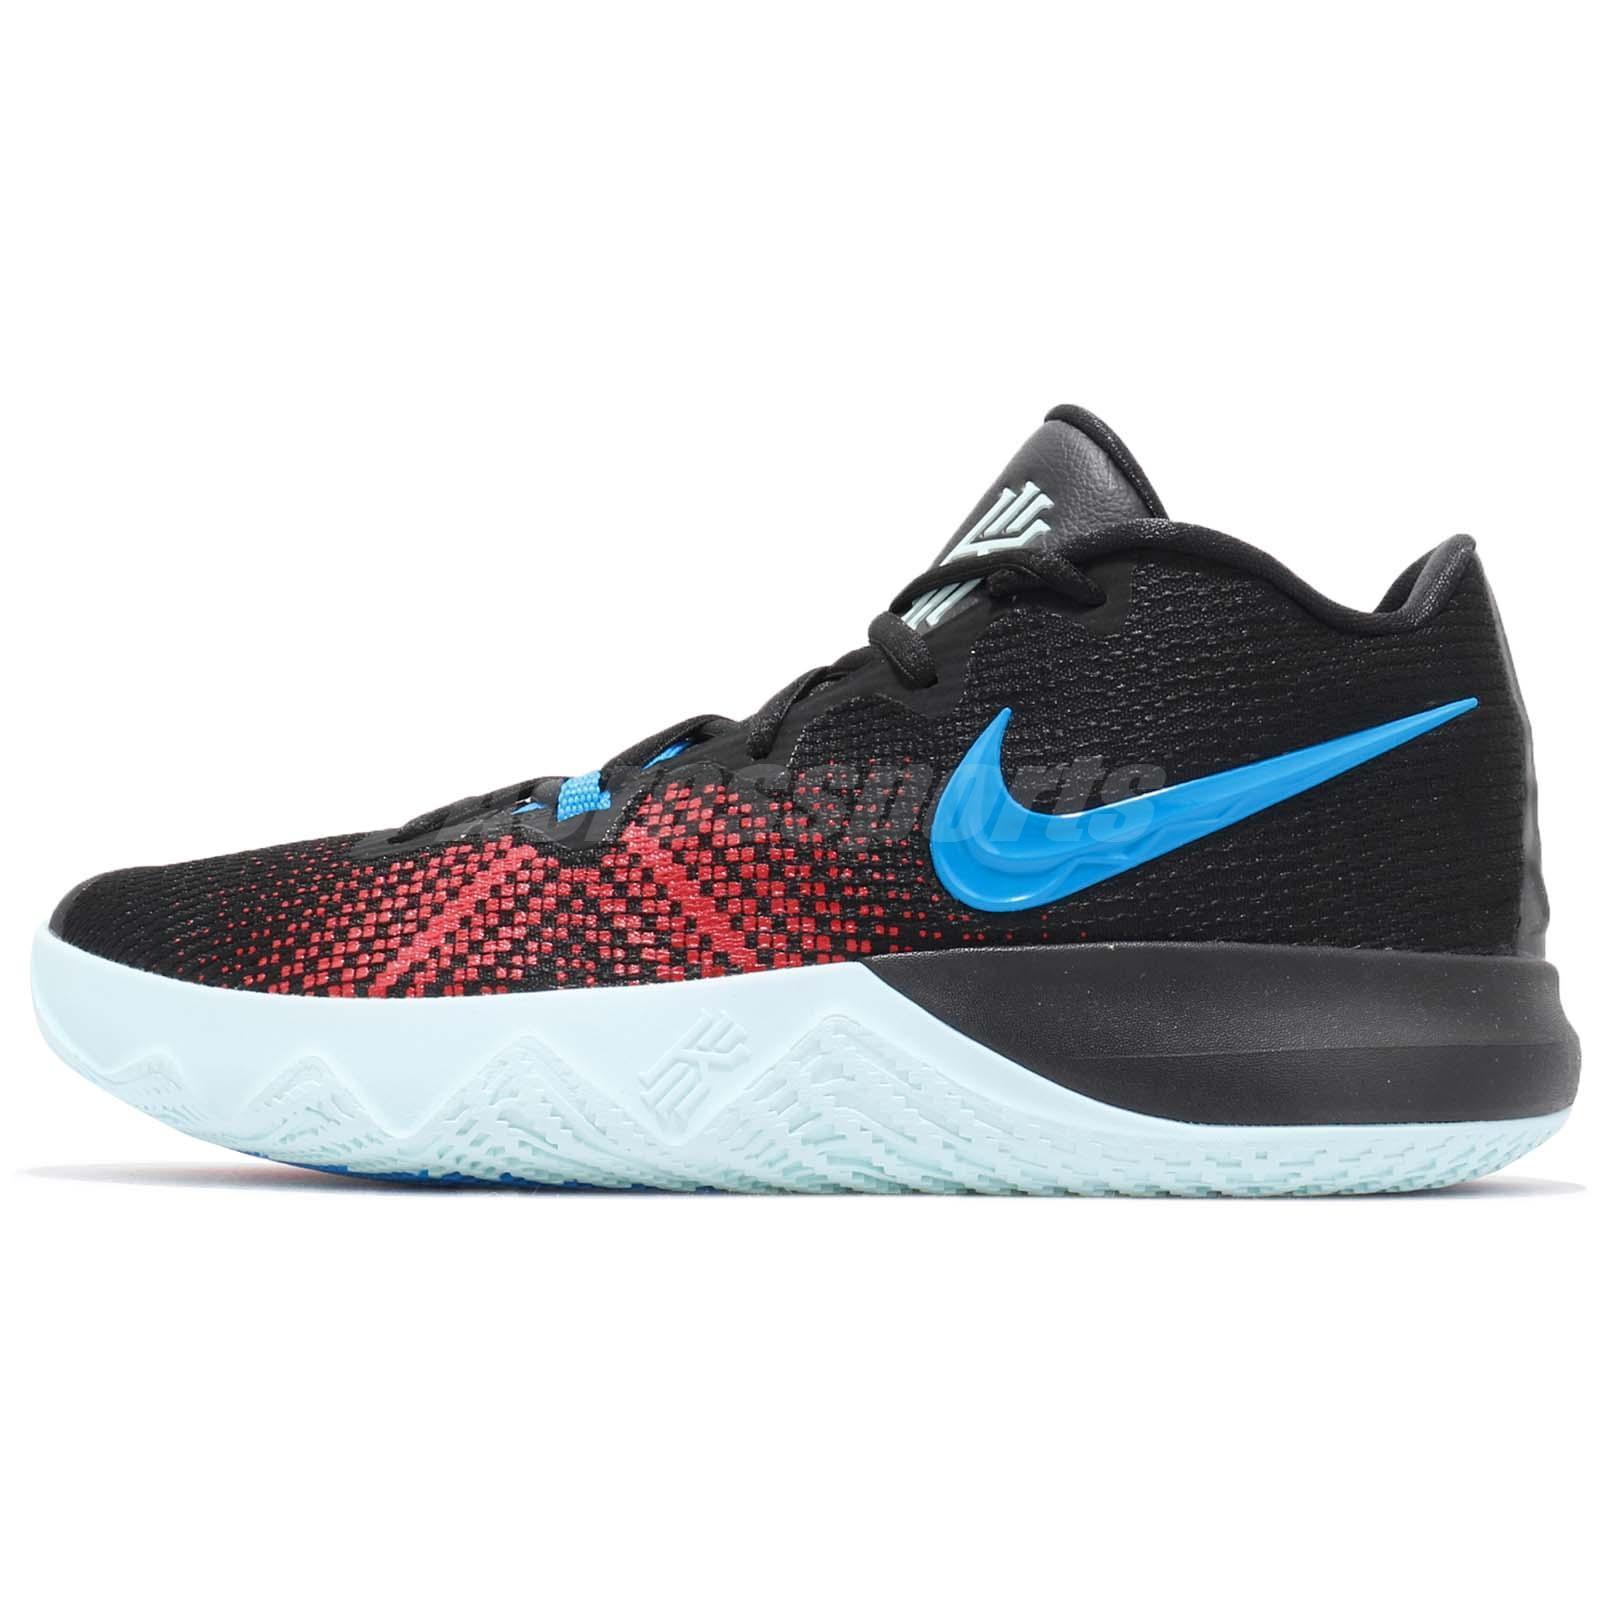 b3dc87b258d9 Nike Kyrie Flytrap EP Irving Black Blue Red Men Basketball Shoes AJ1935-002